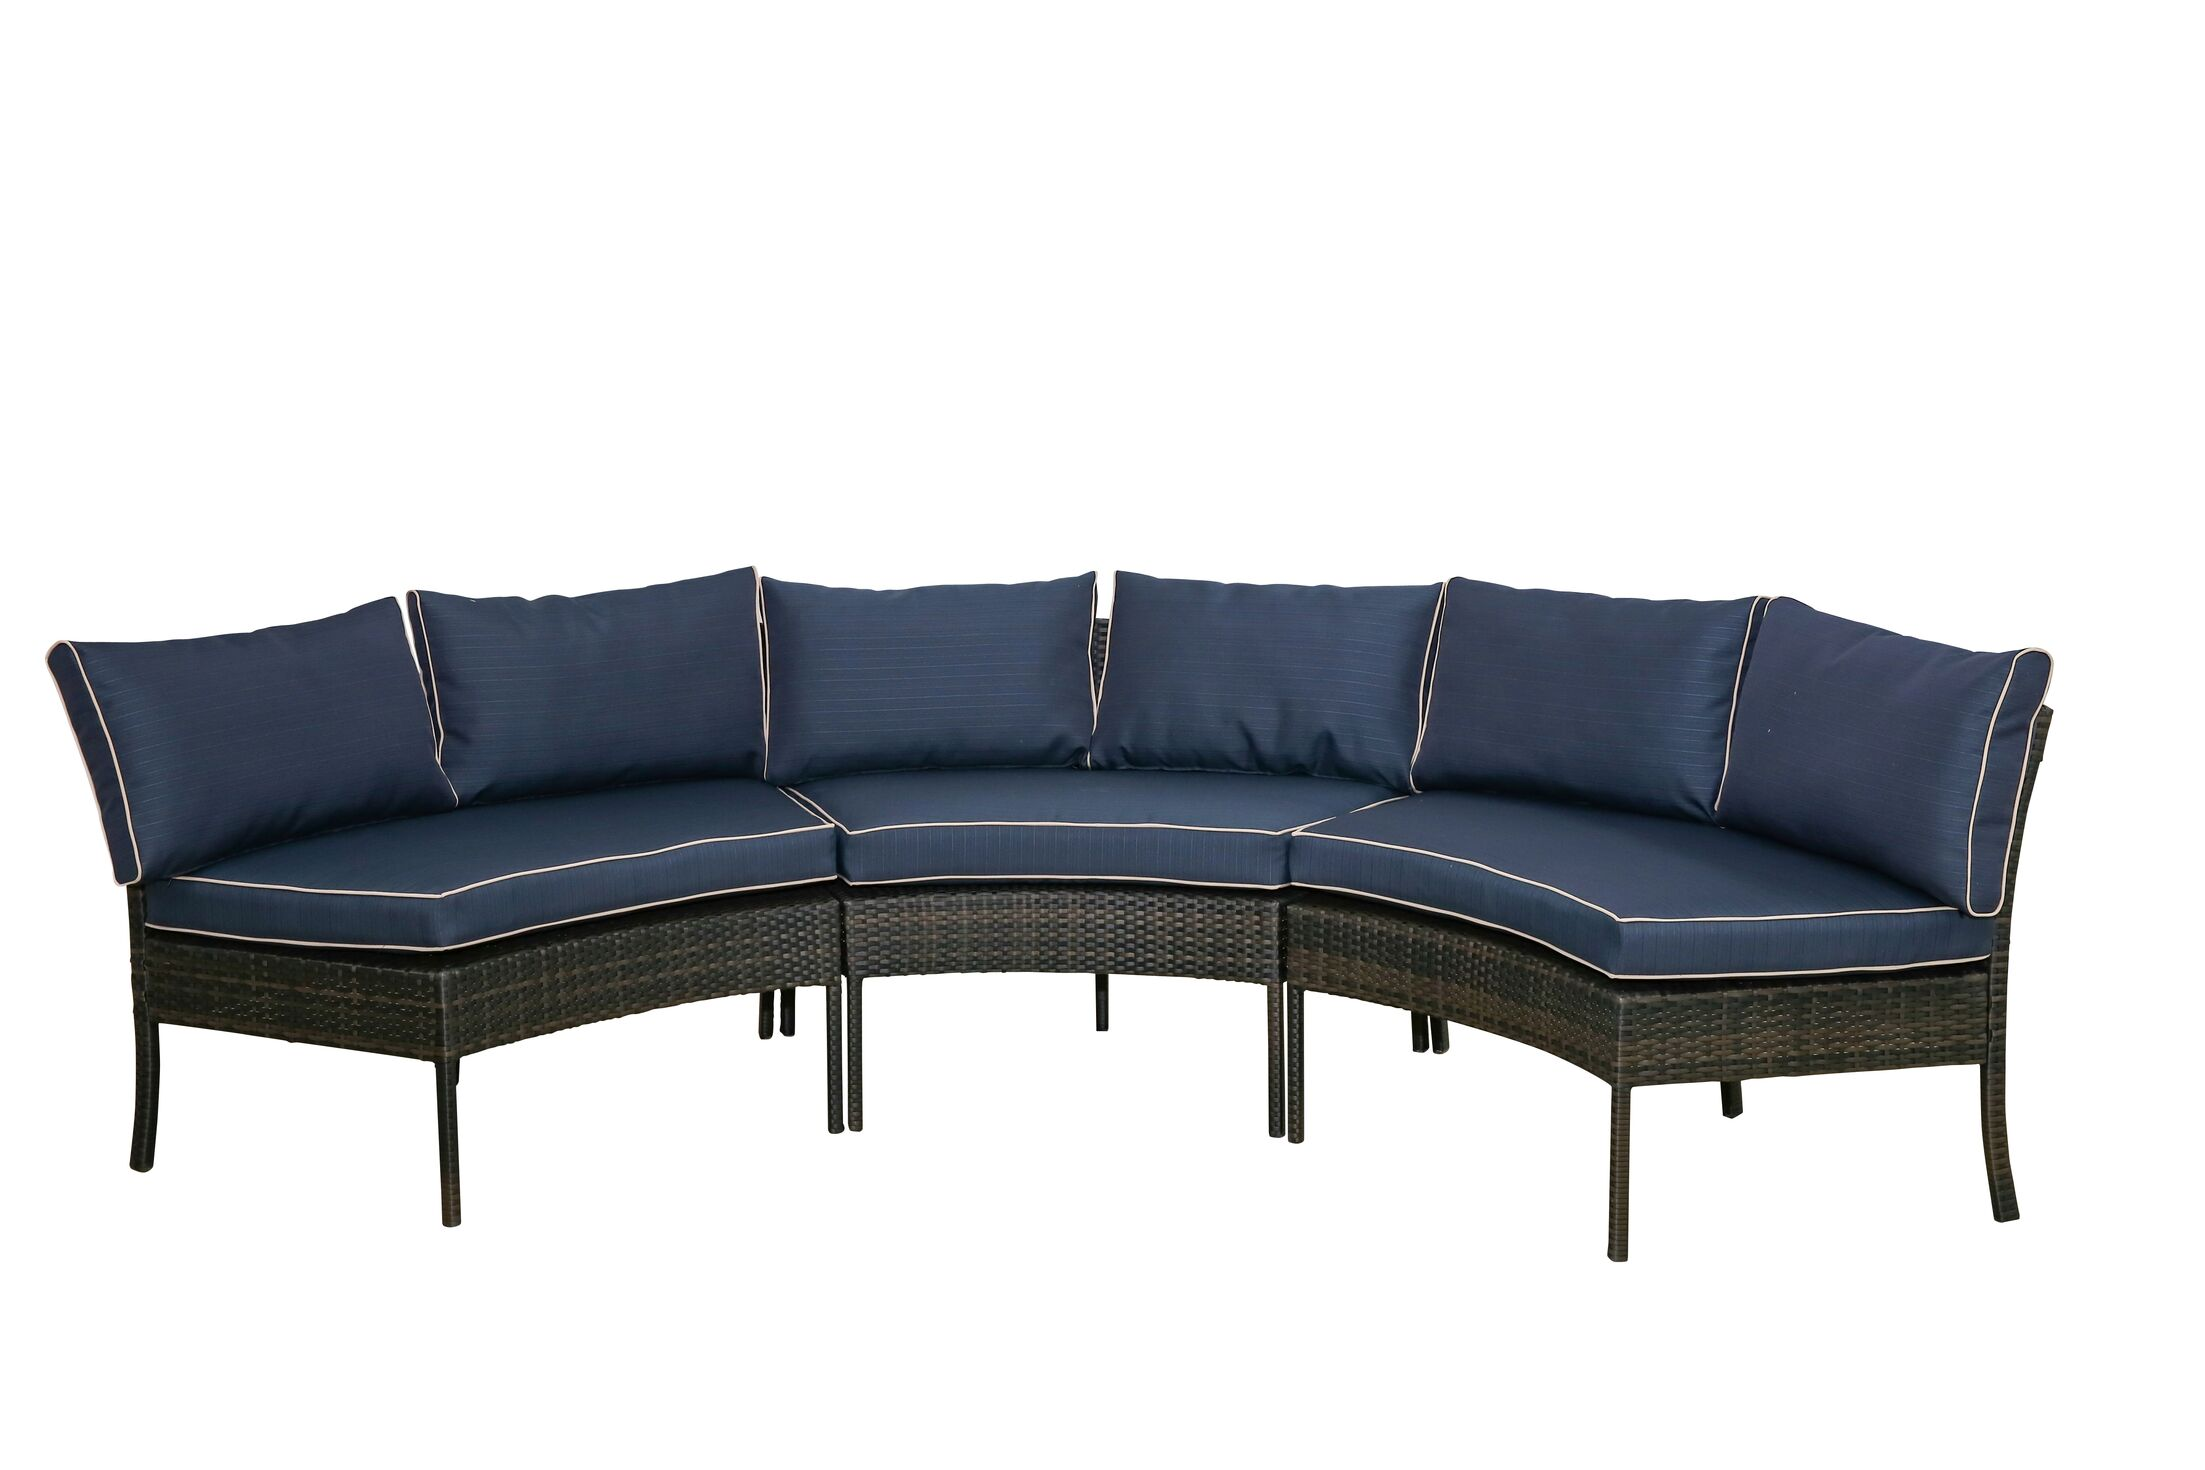 Petunia Circular Patio Sectional with Cushions Cushion Color: Blue